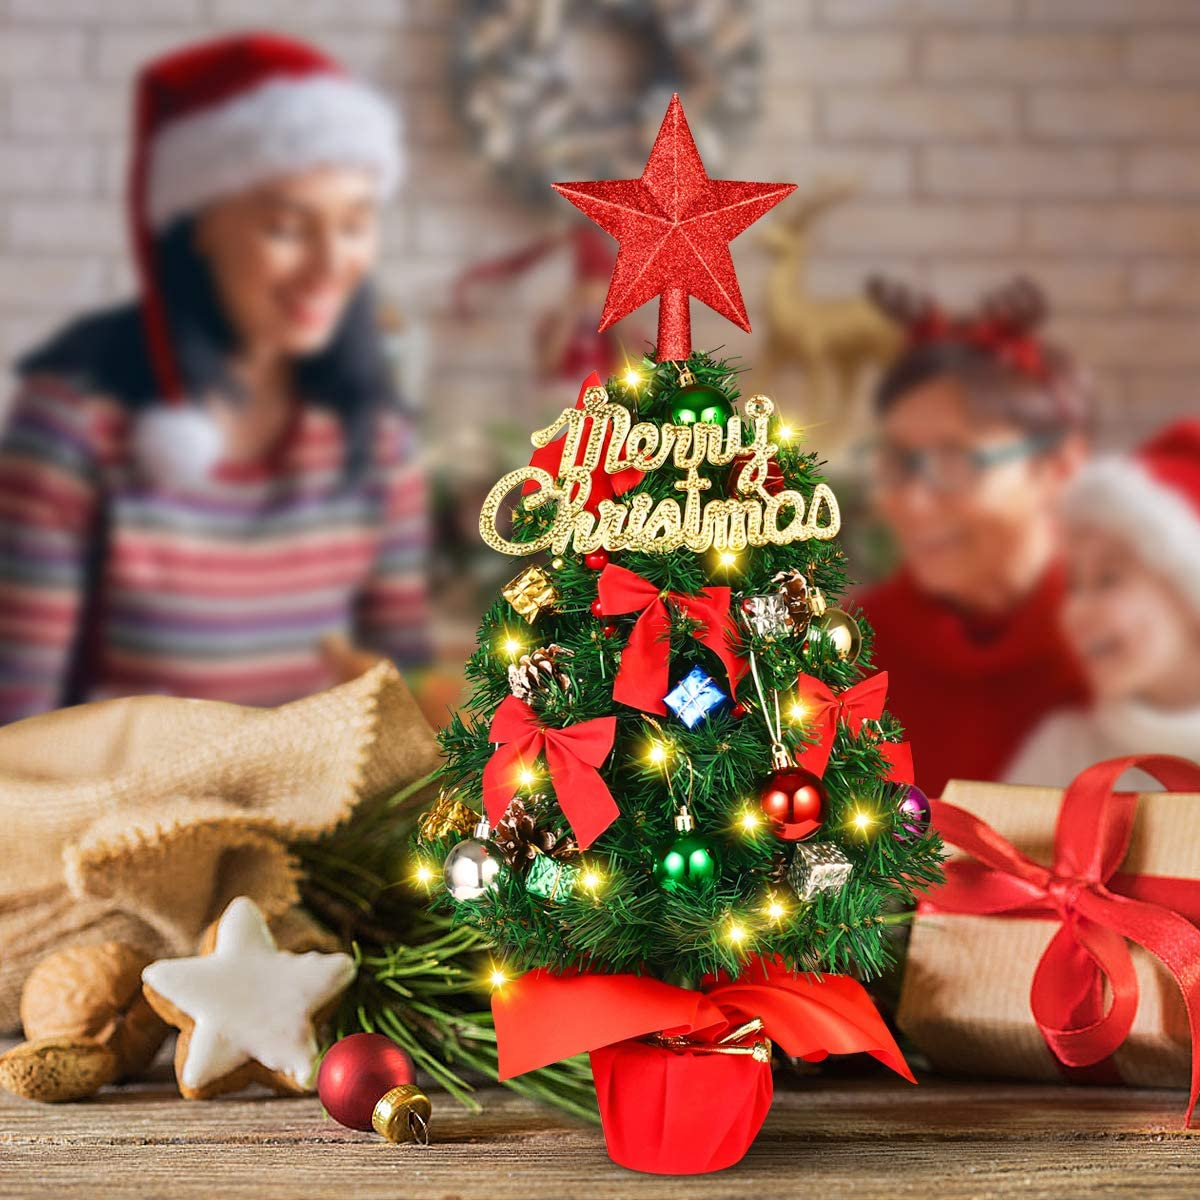 Tabletop Christmas Tree, Artificial Small Christmas Tree with 8 Lighting Modes Christmas Decorations Home Decor